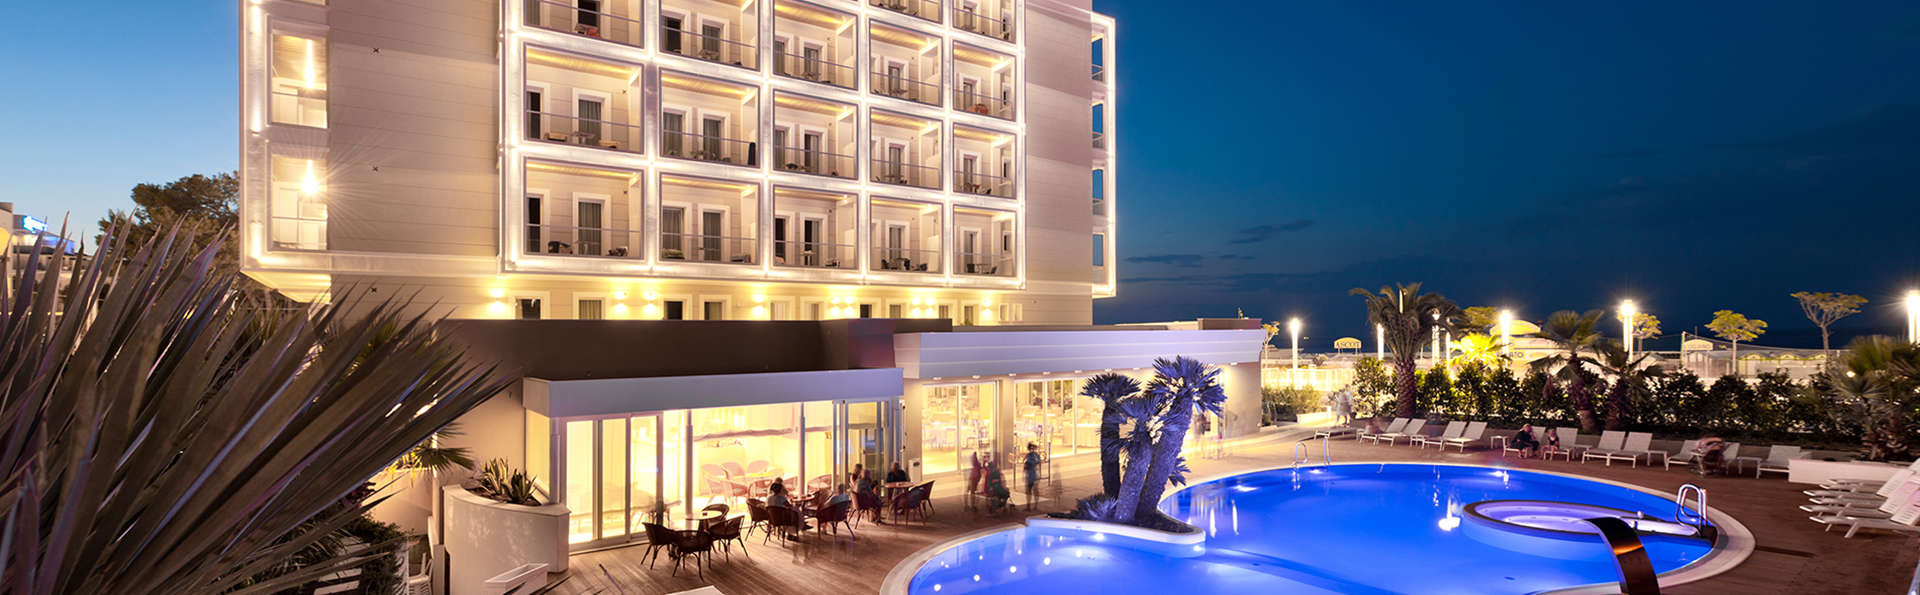 Hotel Ambasciatori - Edit_Pool3.jpg